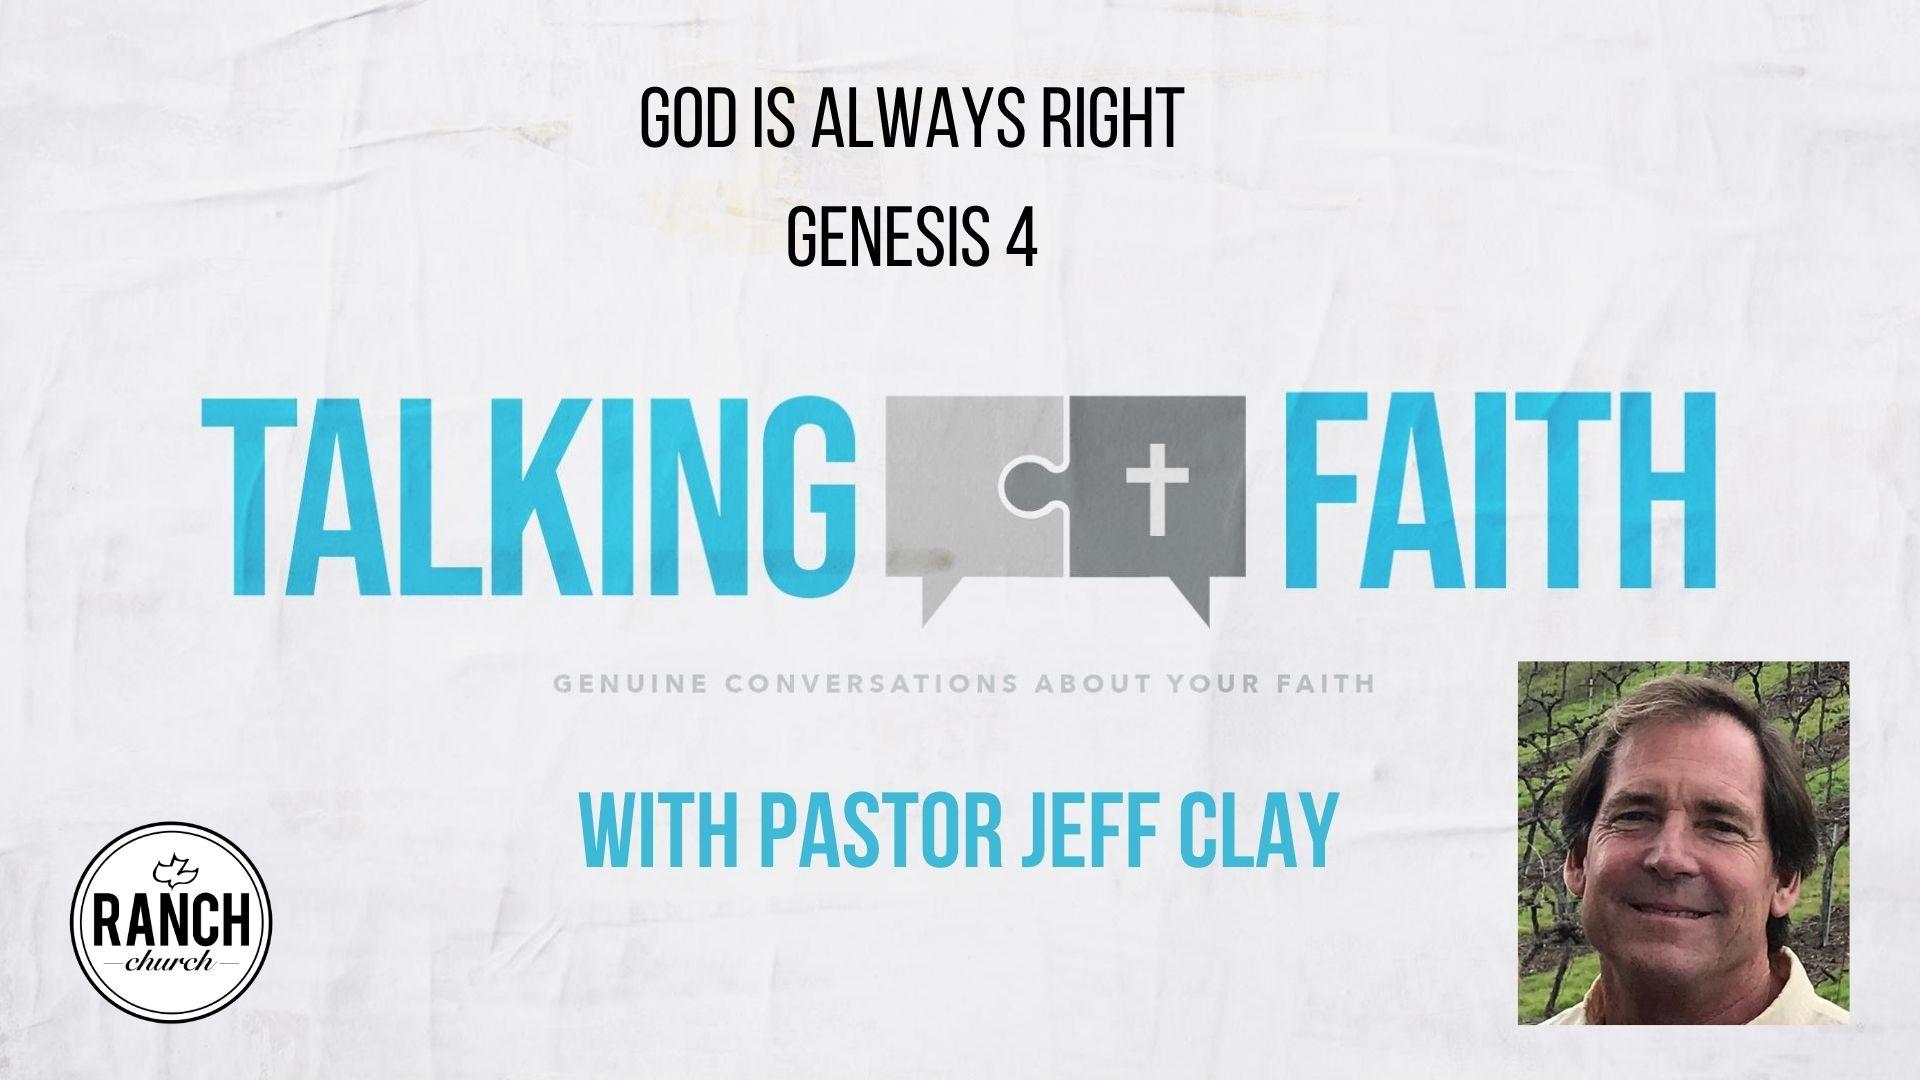 TALKING FAITH 7-28-2020